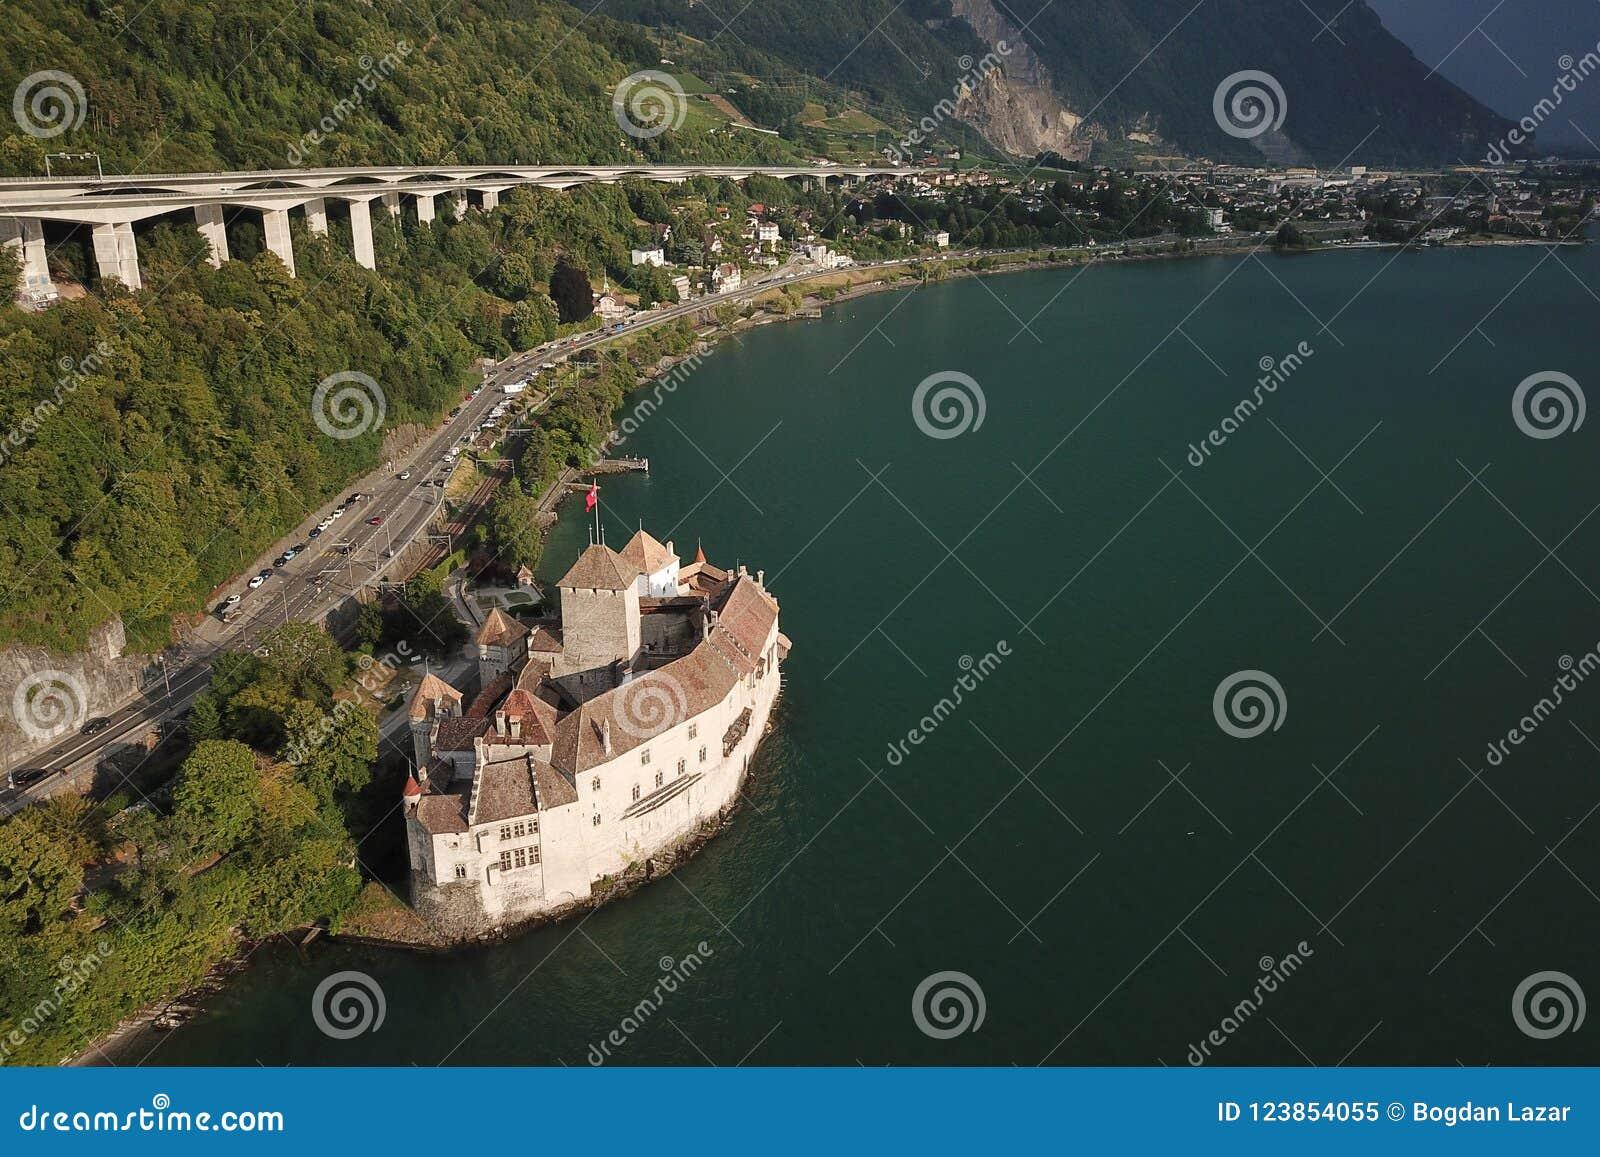 Aerial view Chateau de Chillon Common , Switzerland